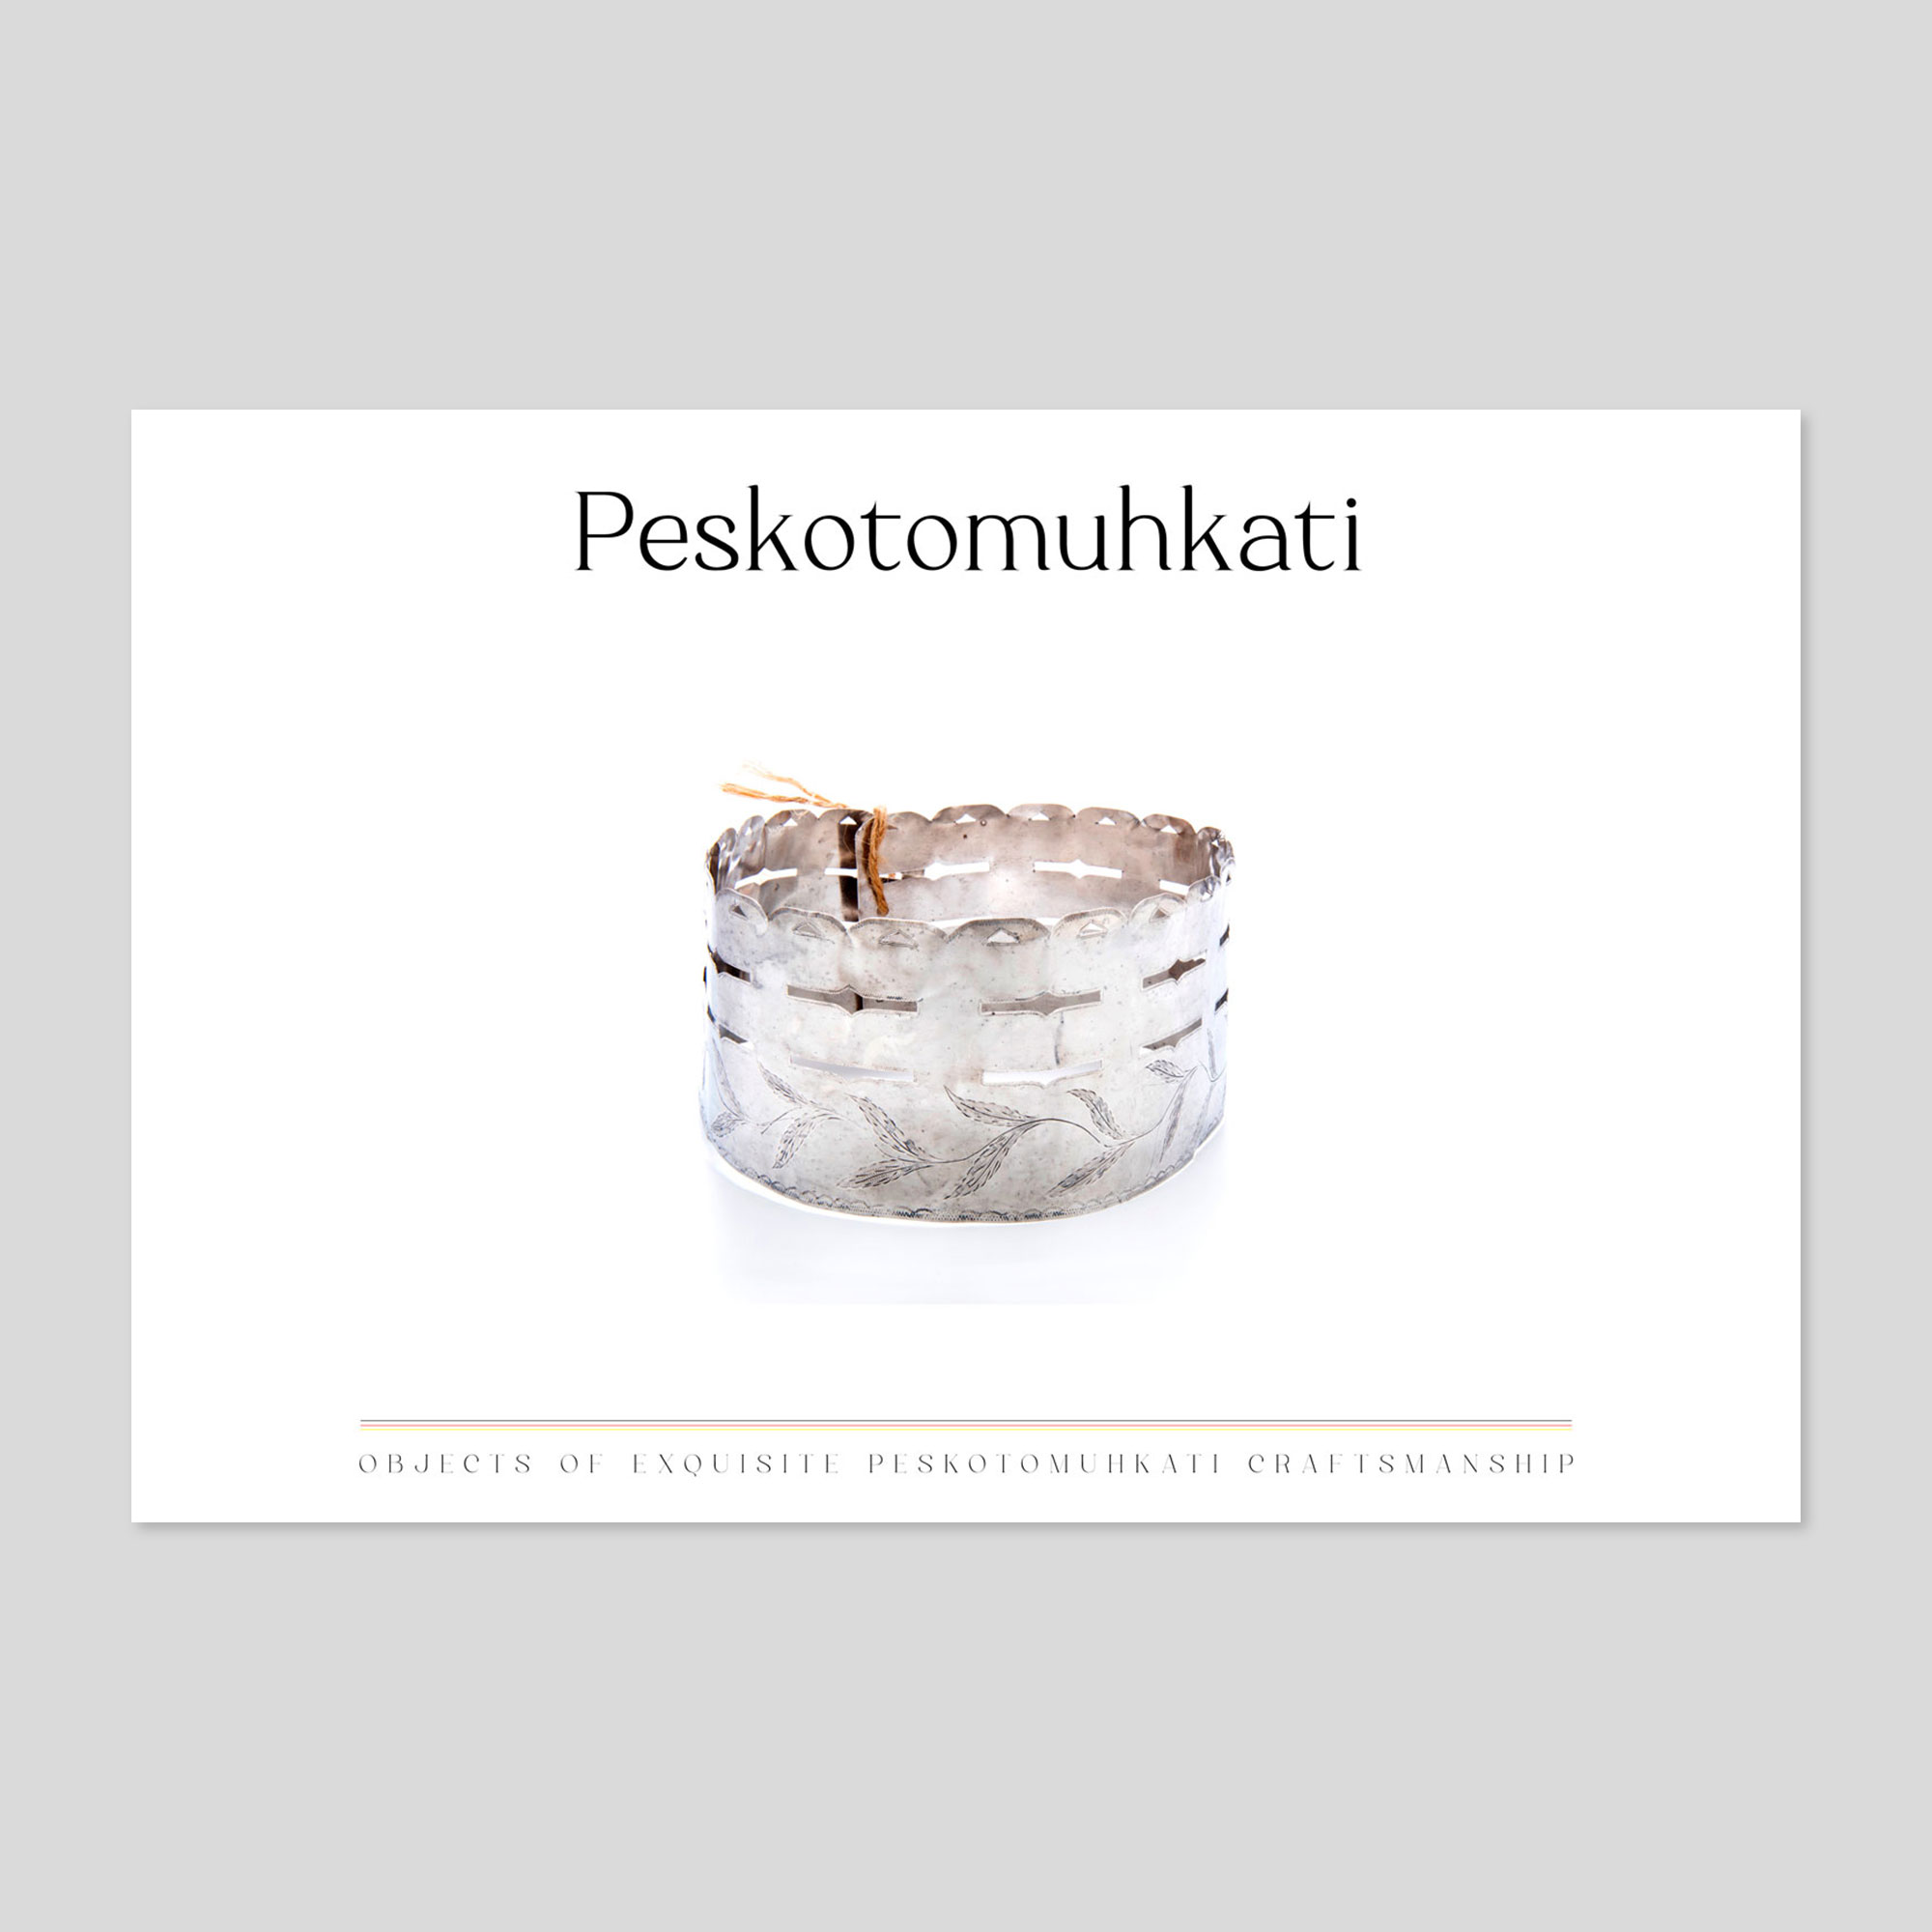 009-peskotomuhkati-silver-crown-wapi-maniyey-tanosqesun-web